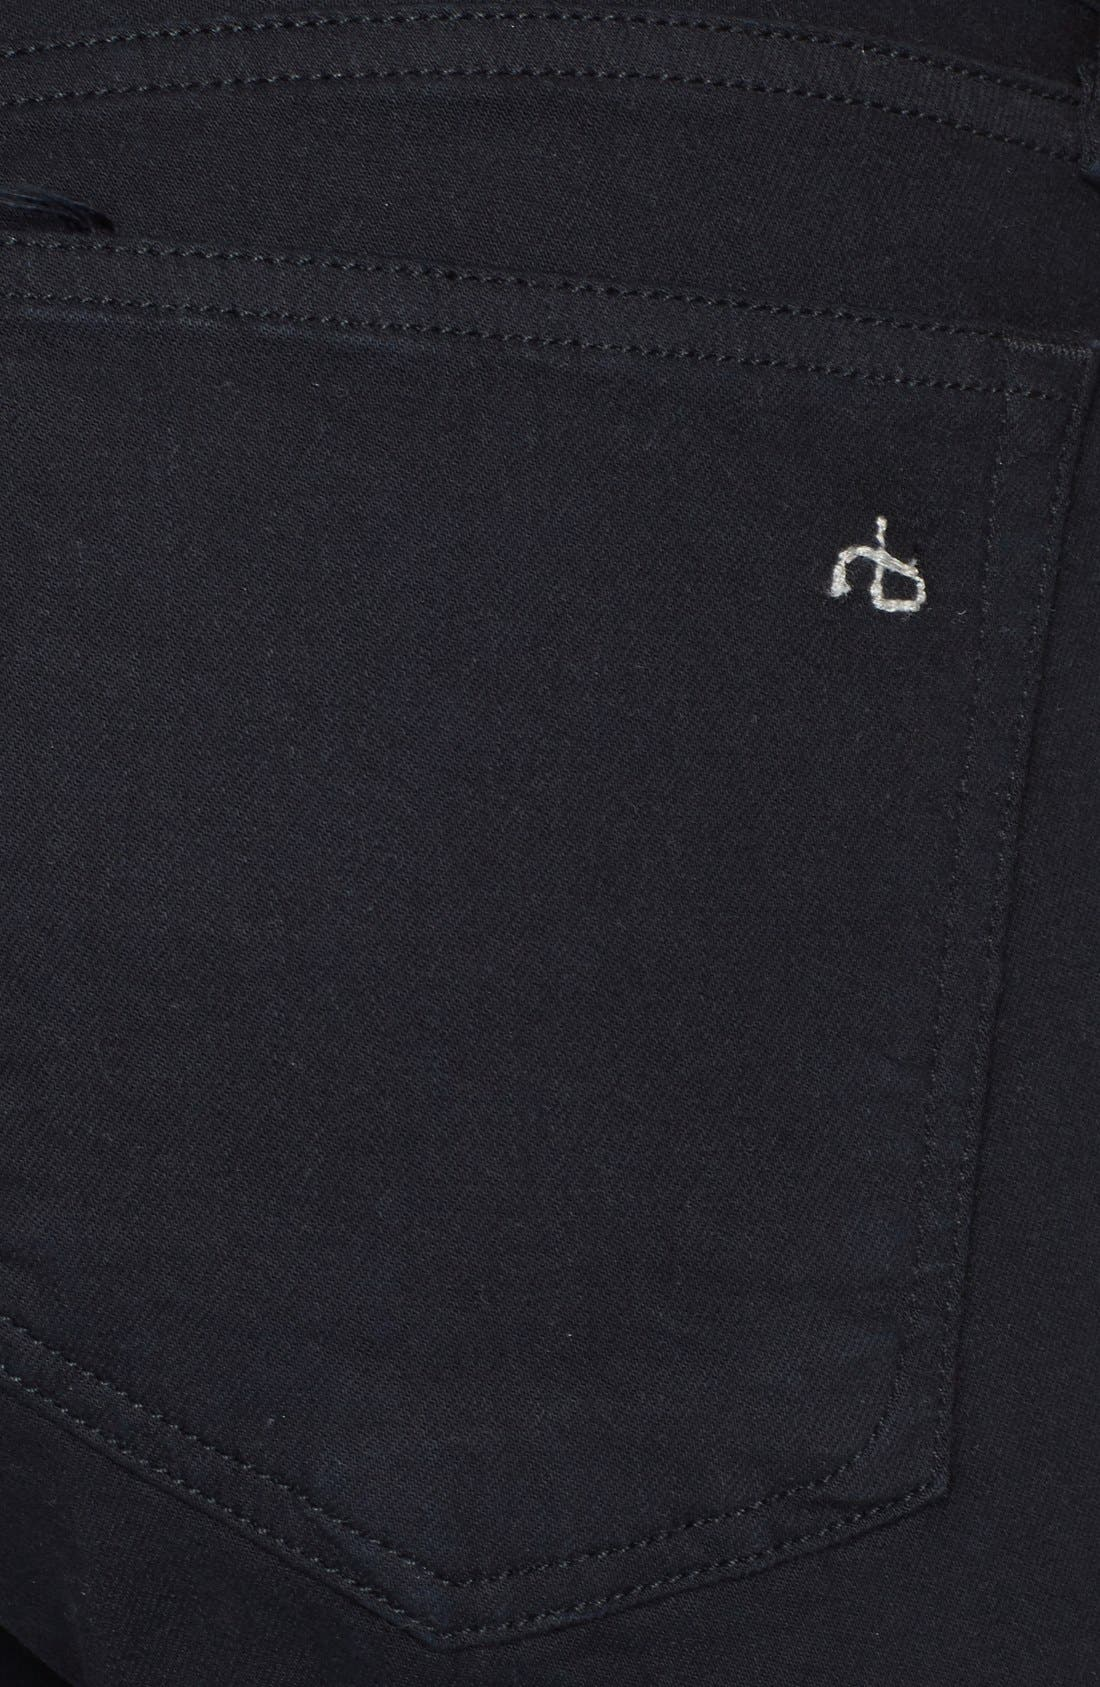 'The Dre' Skinny Jeans,                             Alternate thumbnail 18, color,